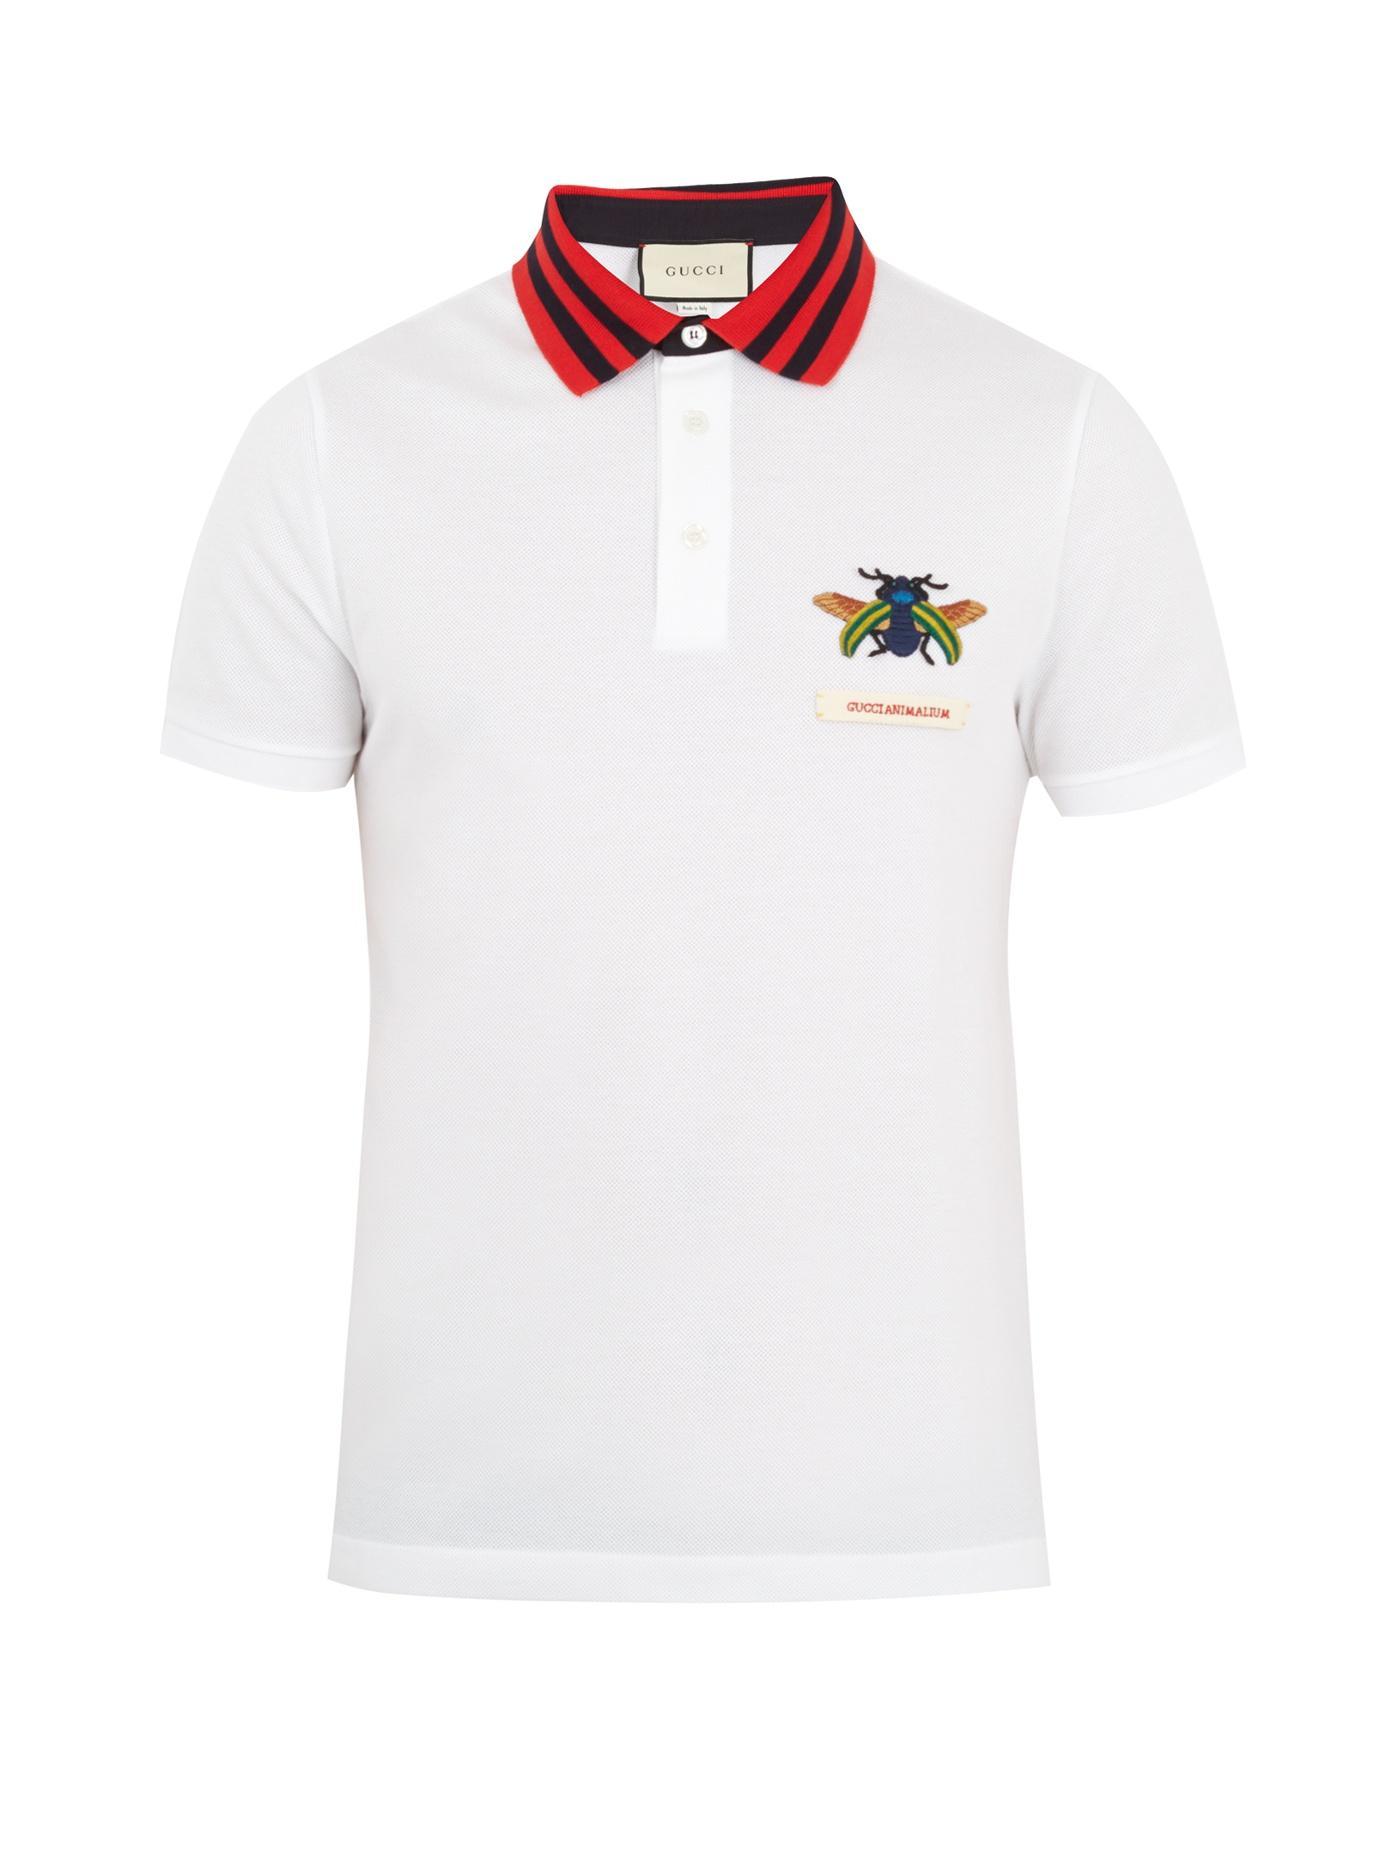 5955a1a2887 Gucci - Beetle Appliqué Cotton Piqué Polo Shirt - Mens - White Multi ...